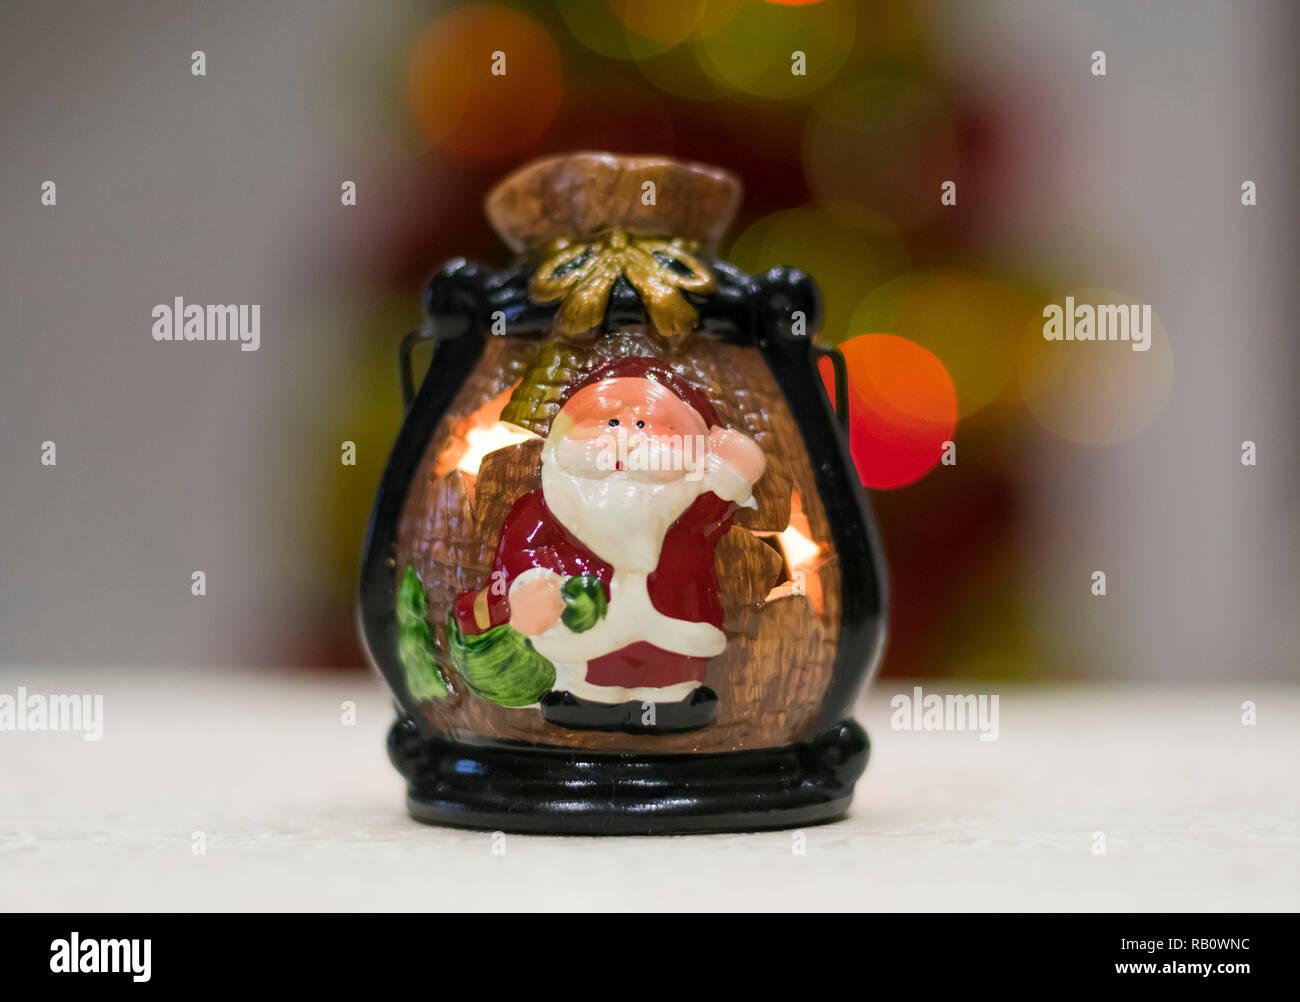 Christmas Candlestick - Stock Image